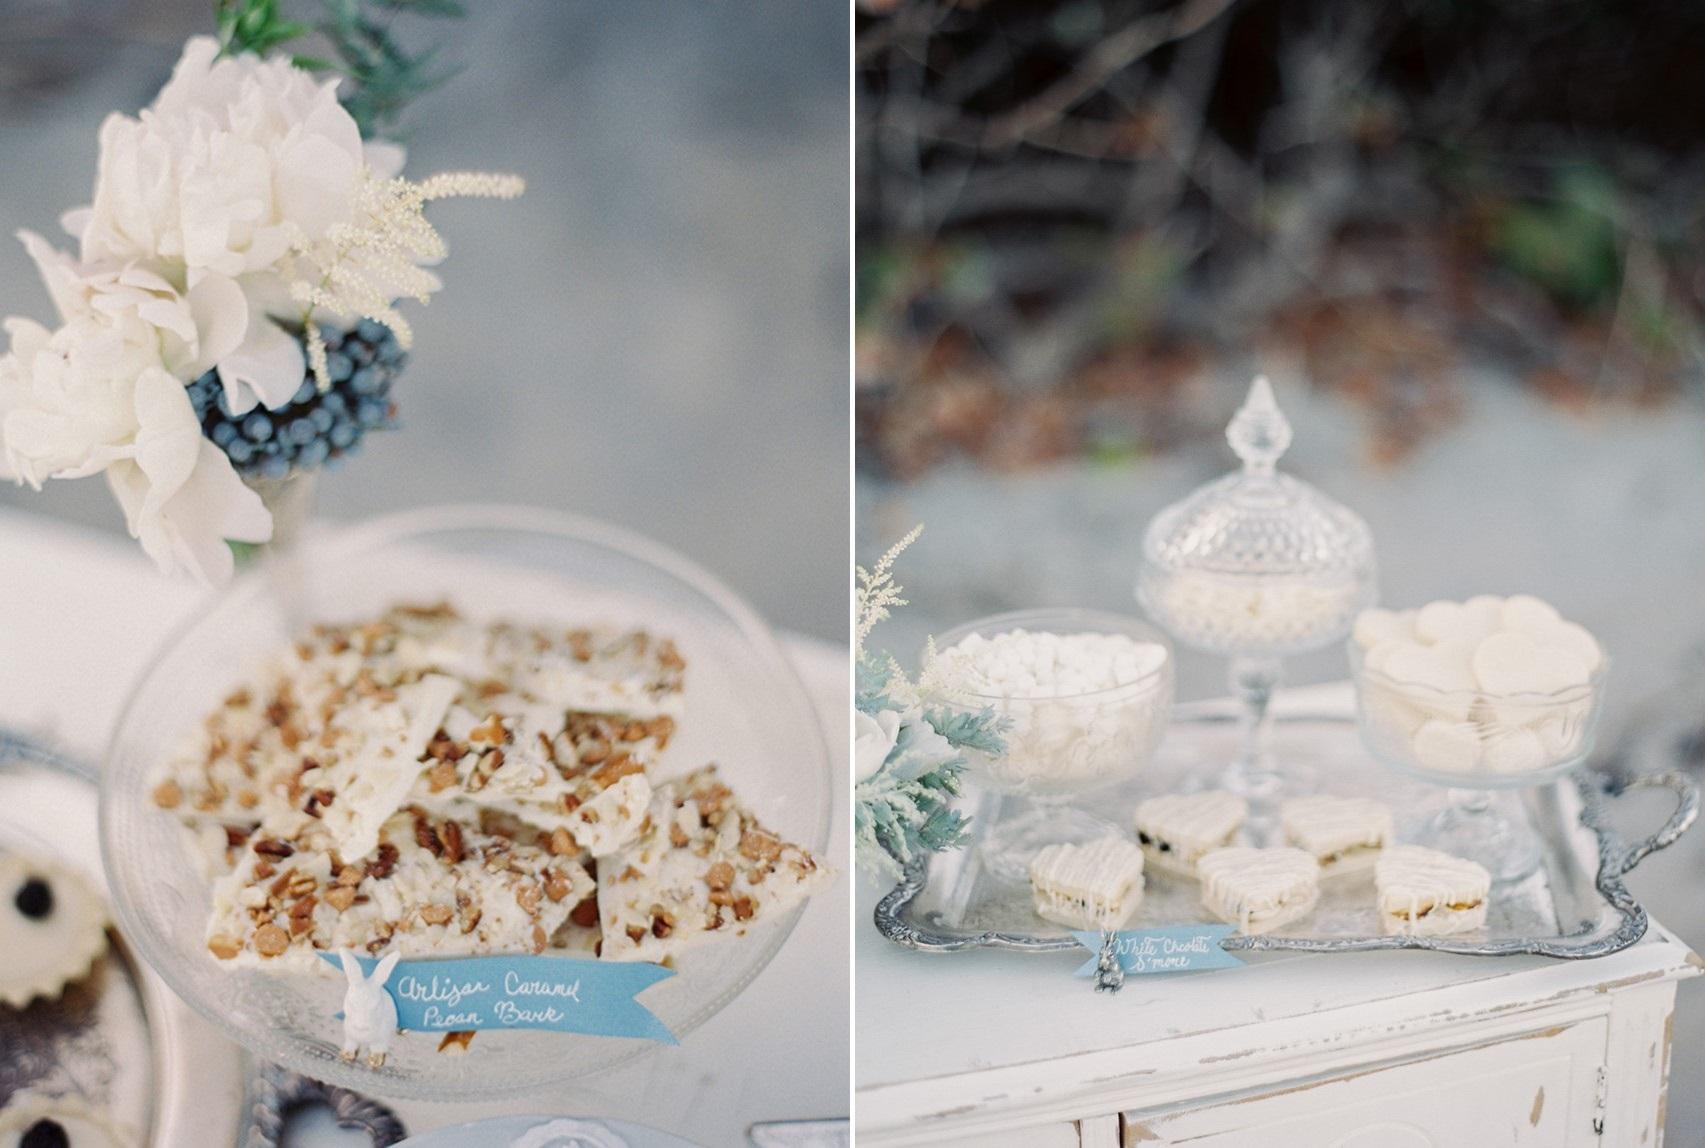 'Sea of Love' A Heavenly Beach Wedding Inspiration from Melanie Gabrielle Photography